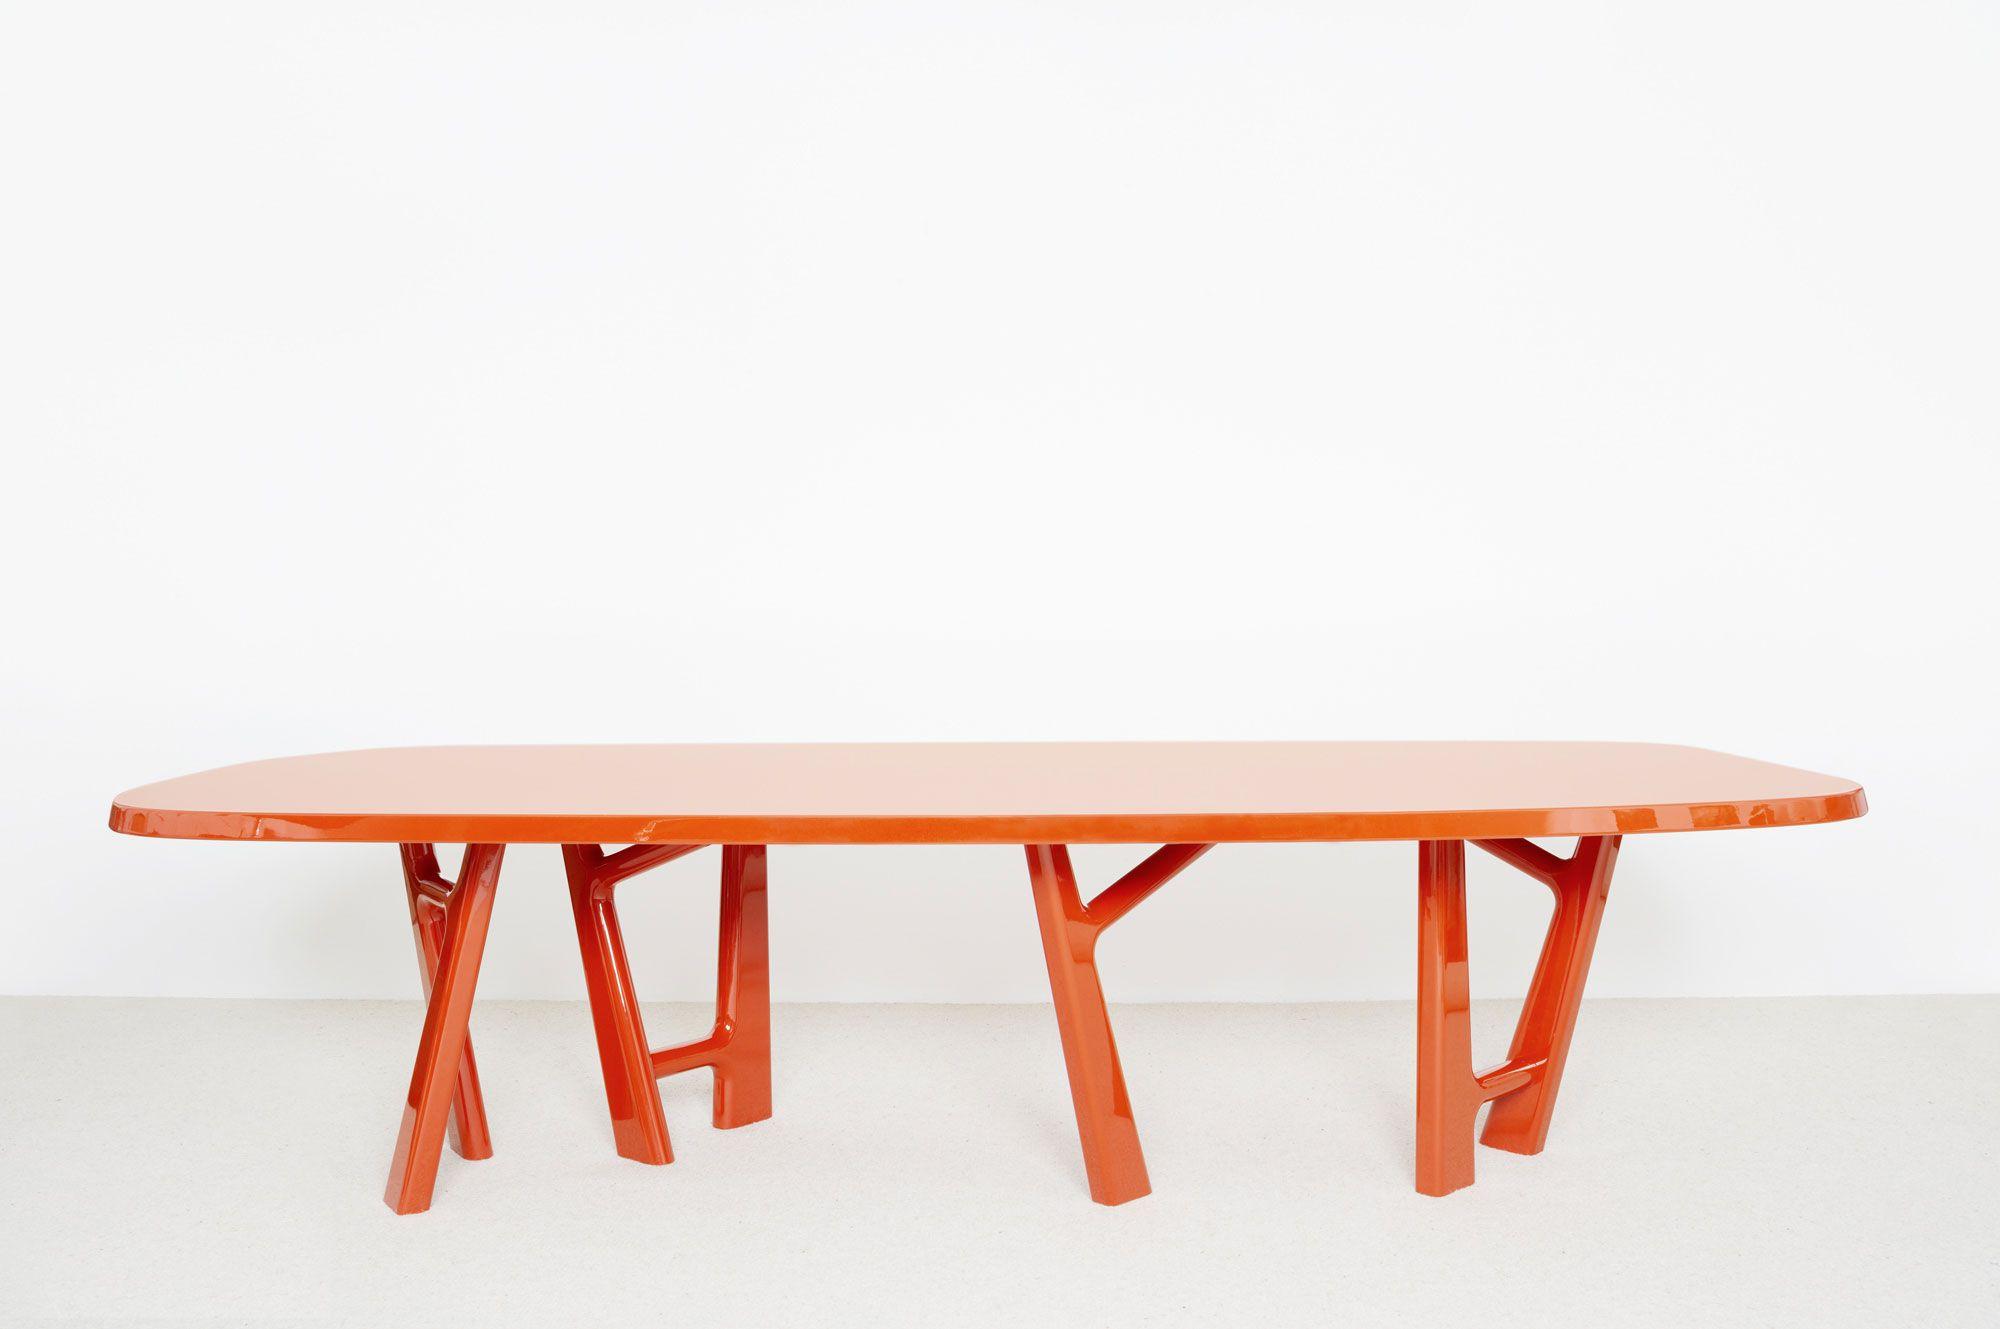 9a7b61473e48b66a13c1c51ca451db63 Incroyable De Table Basse Le Corbusier Concept